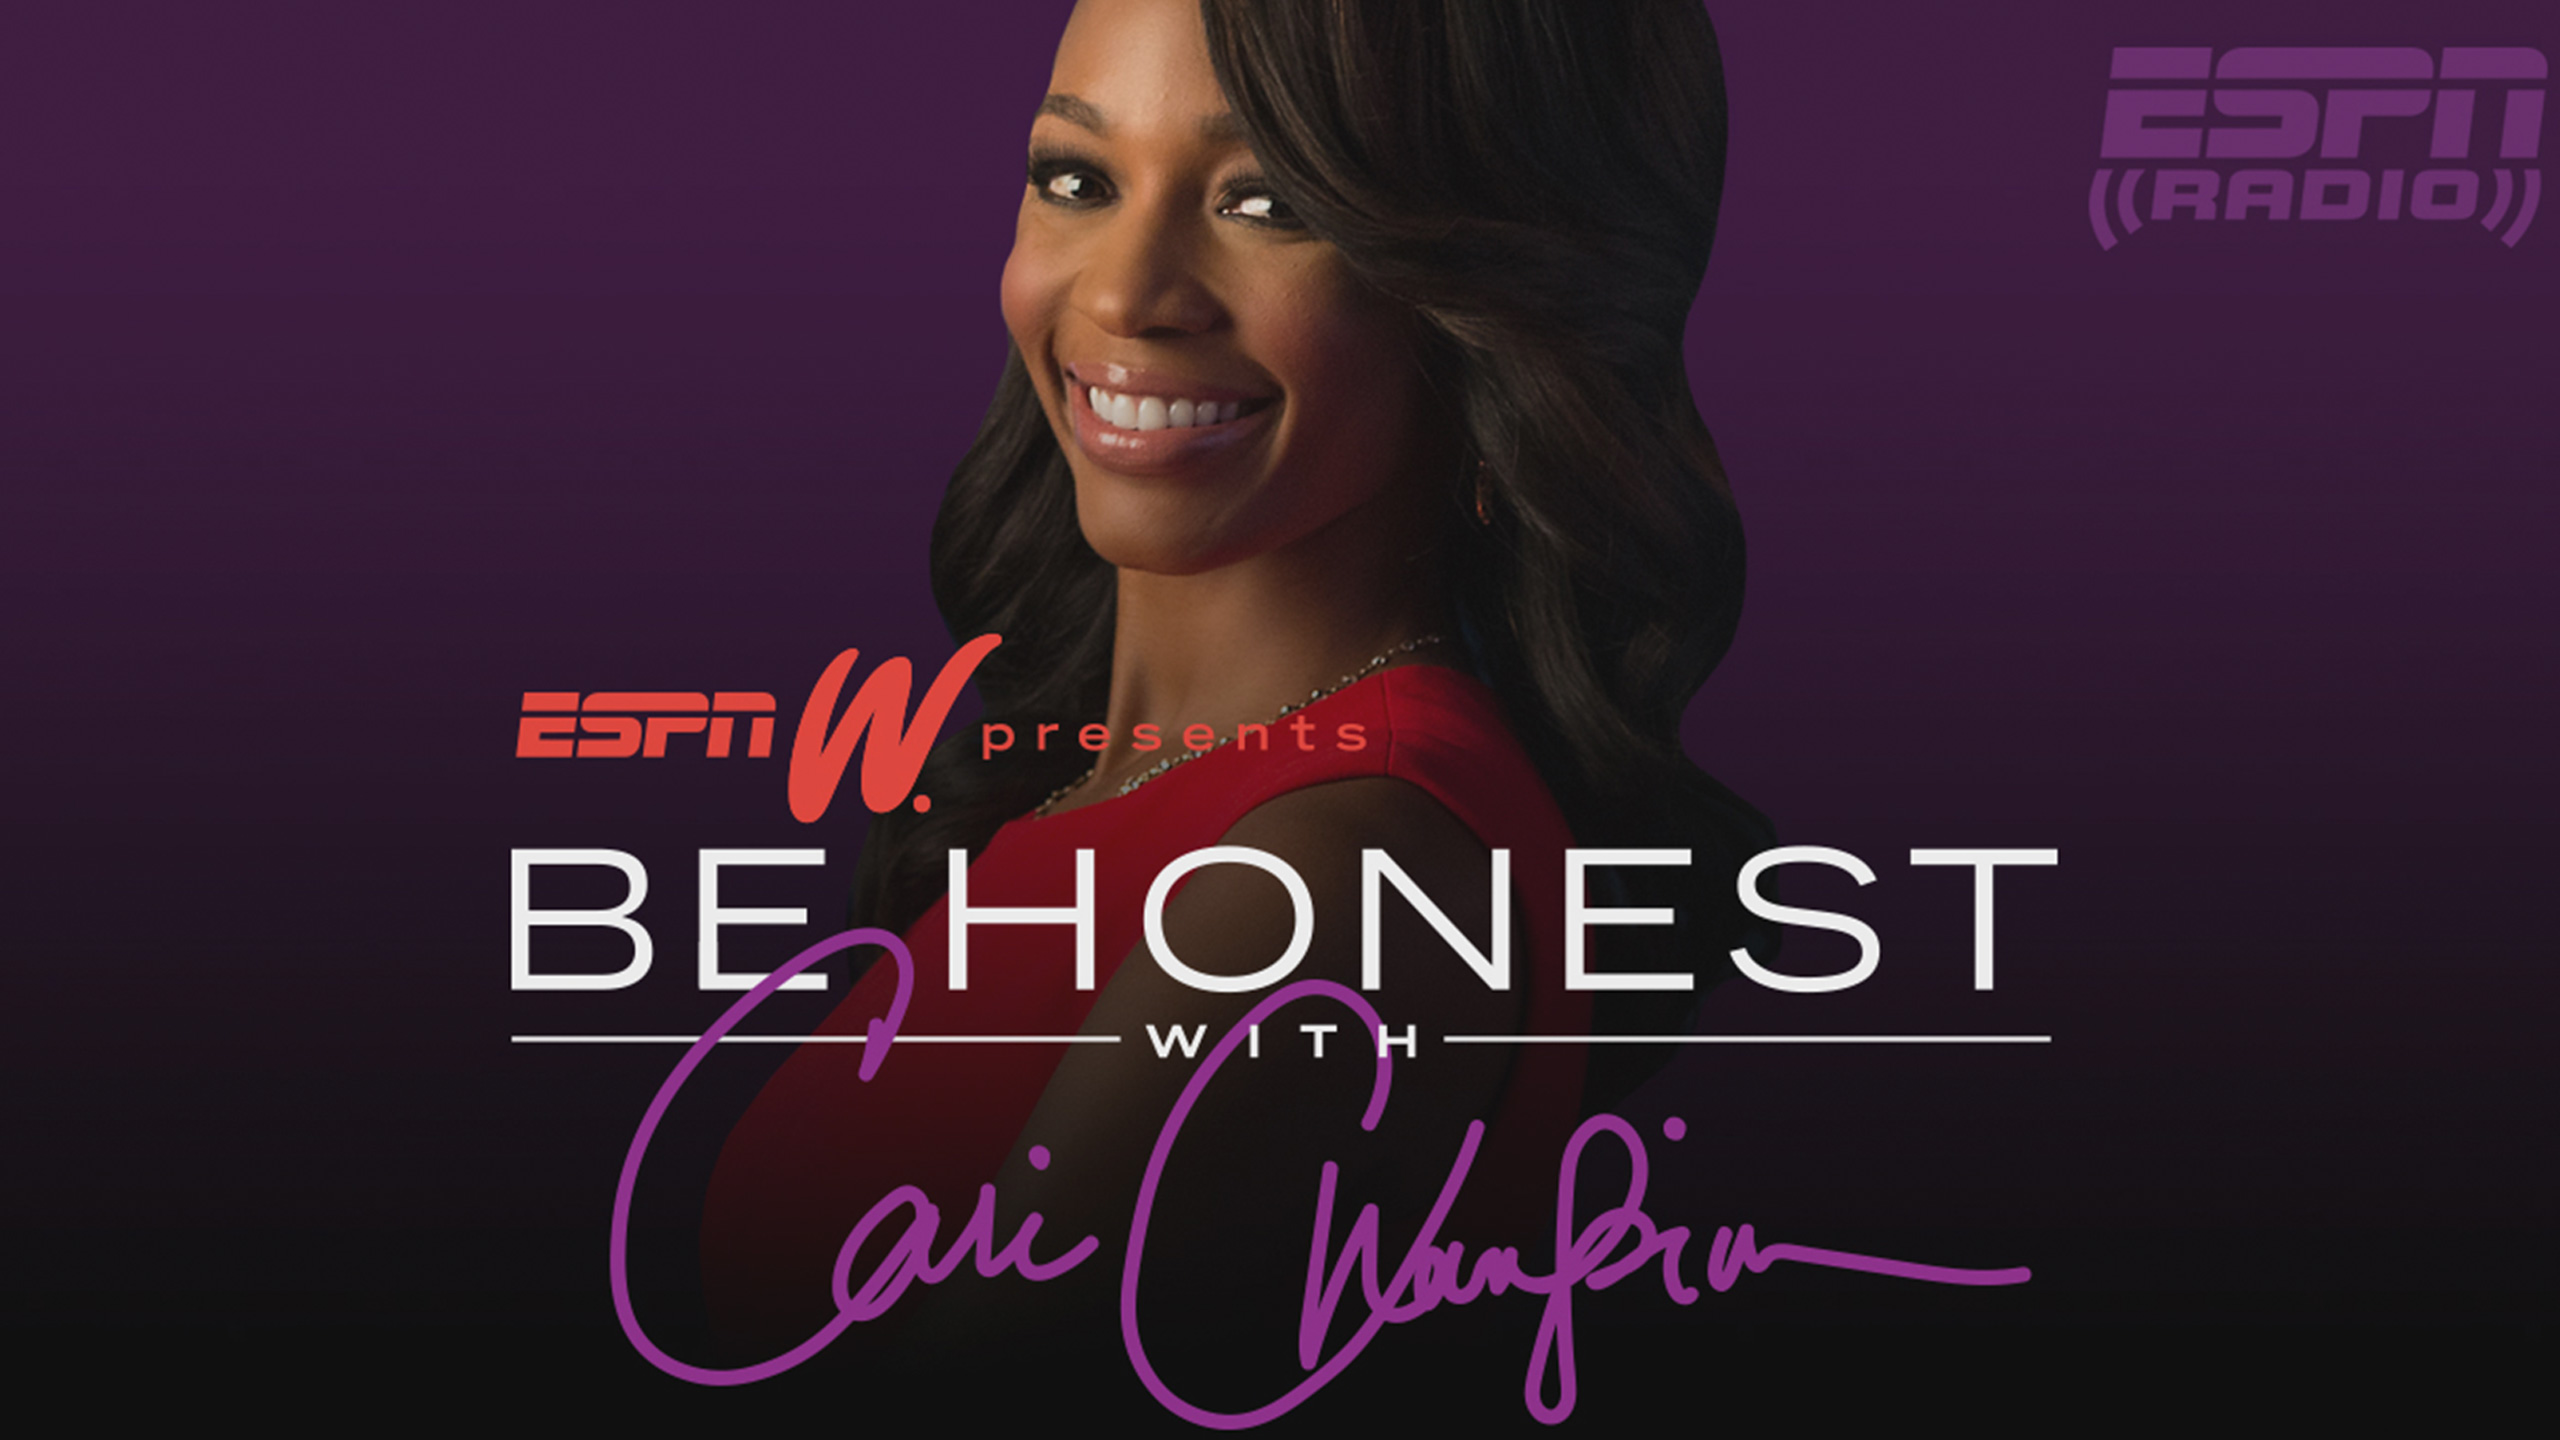 Tue, 1/8 - Be Honest with Cari Champion: Richard Jefferson